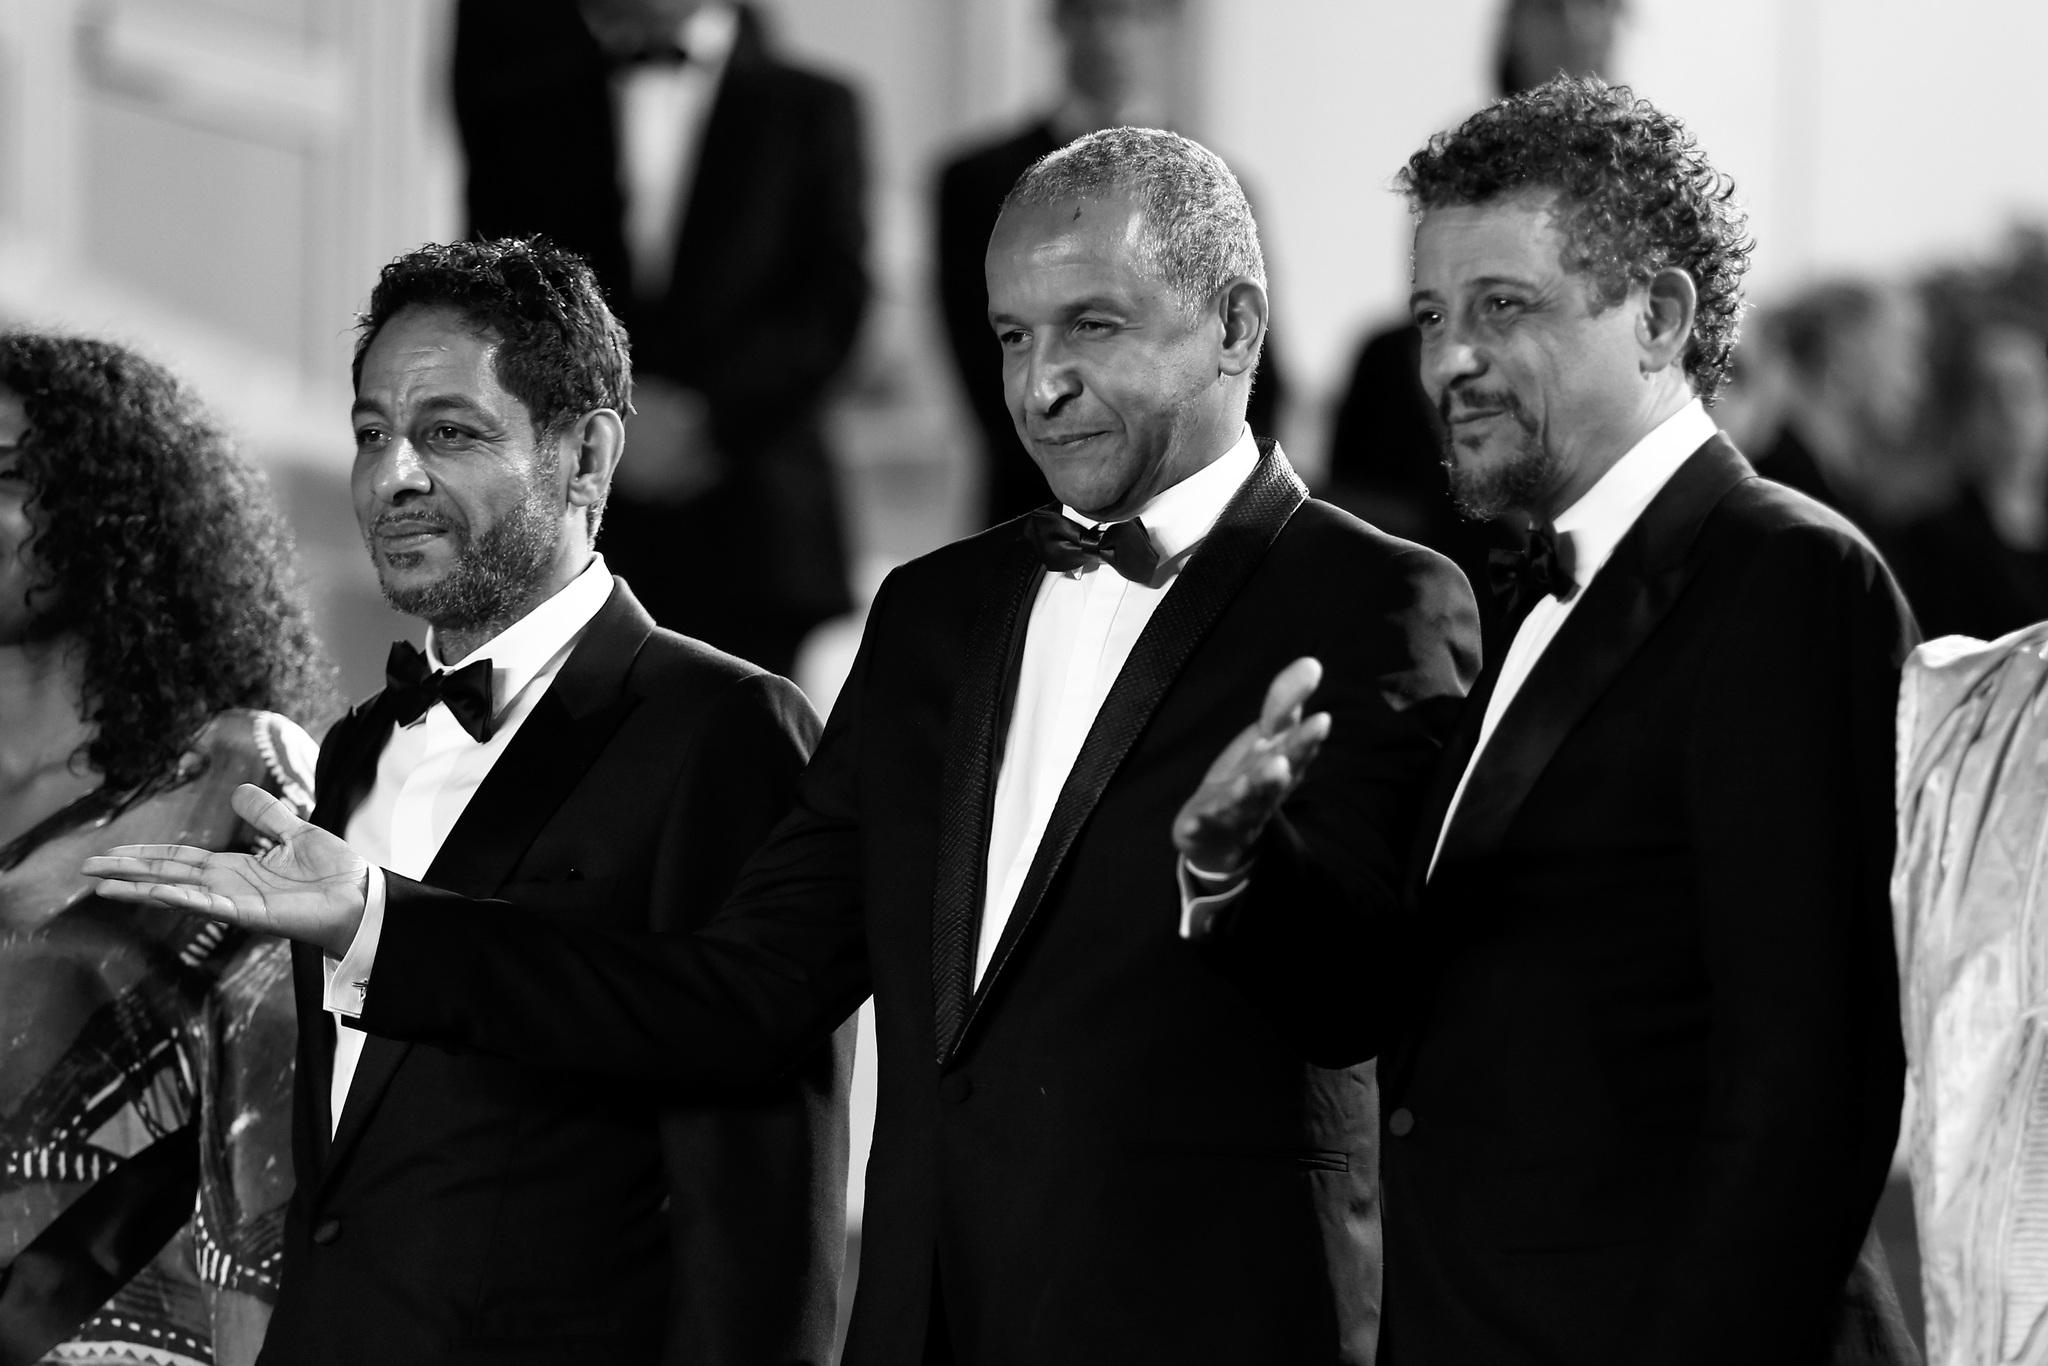 Abel Jafri, Abderrahmane Sissako, and Hichem Yacoubi at an event for Timbuktu (2014)